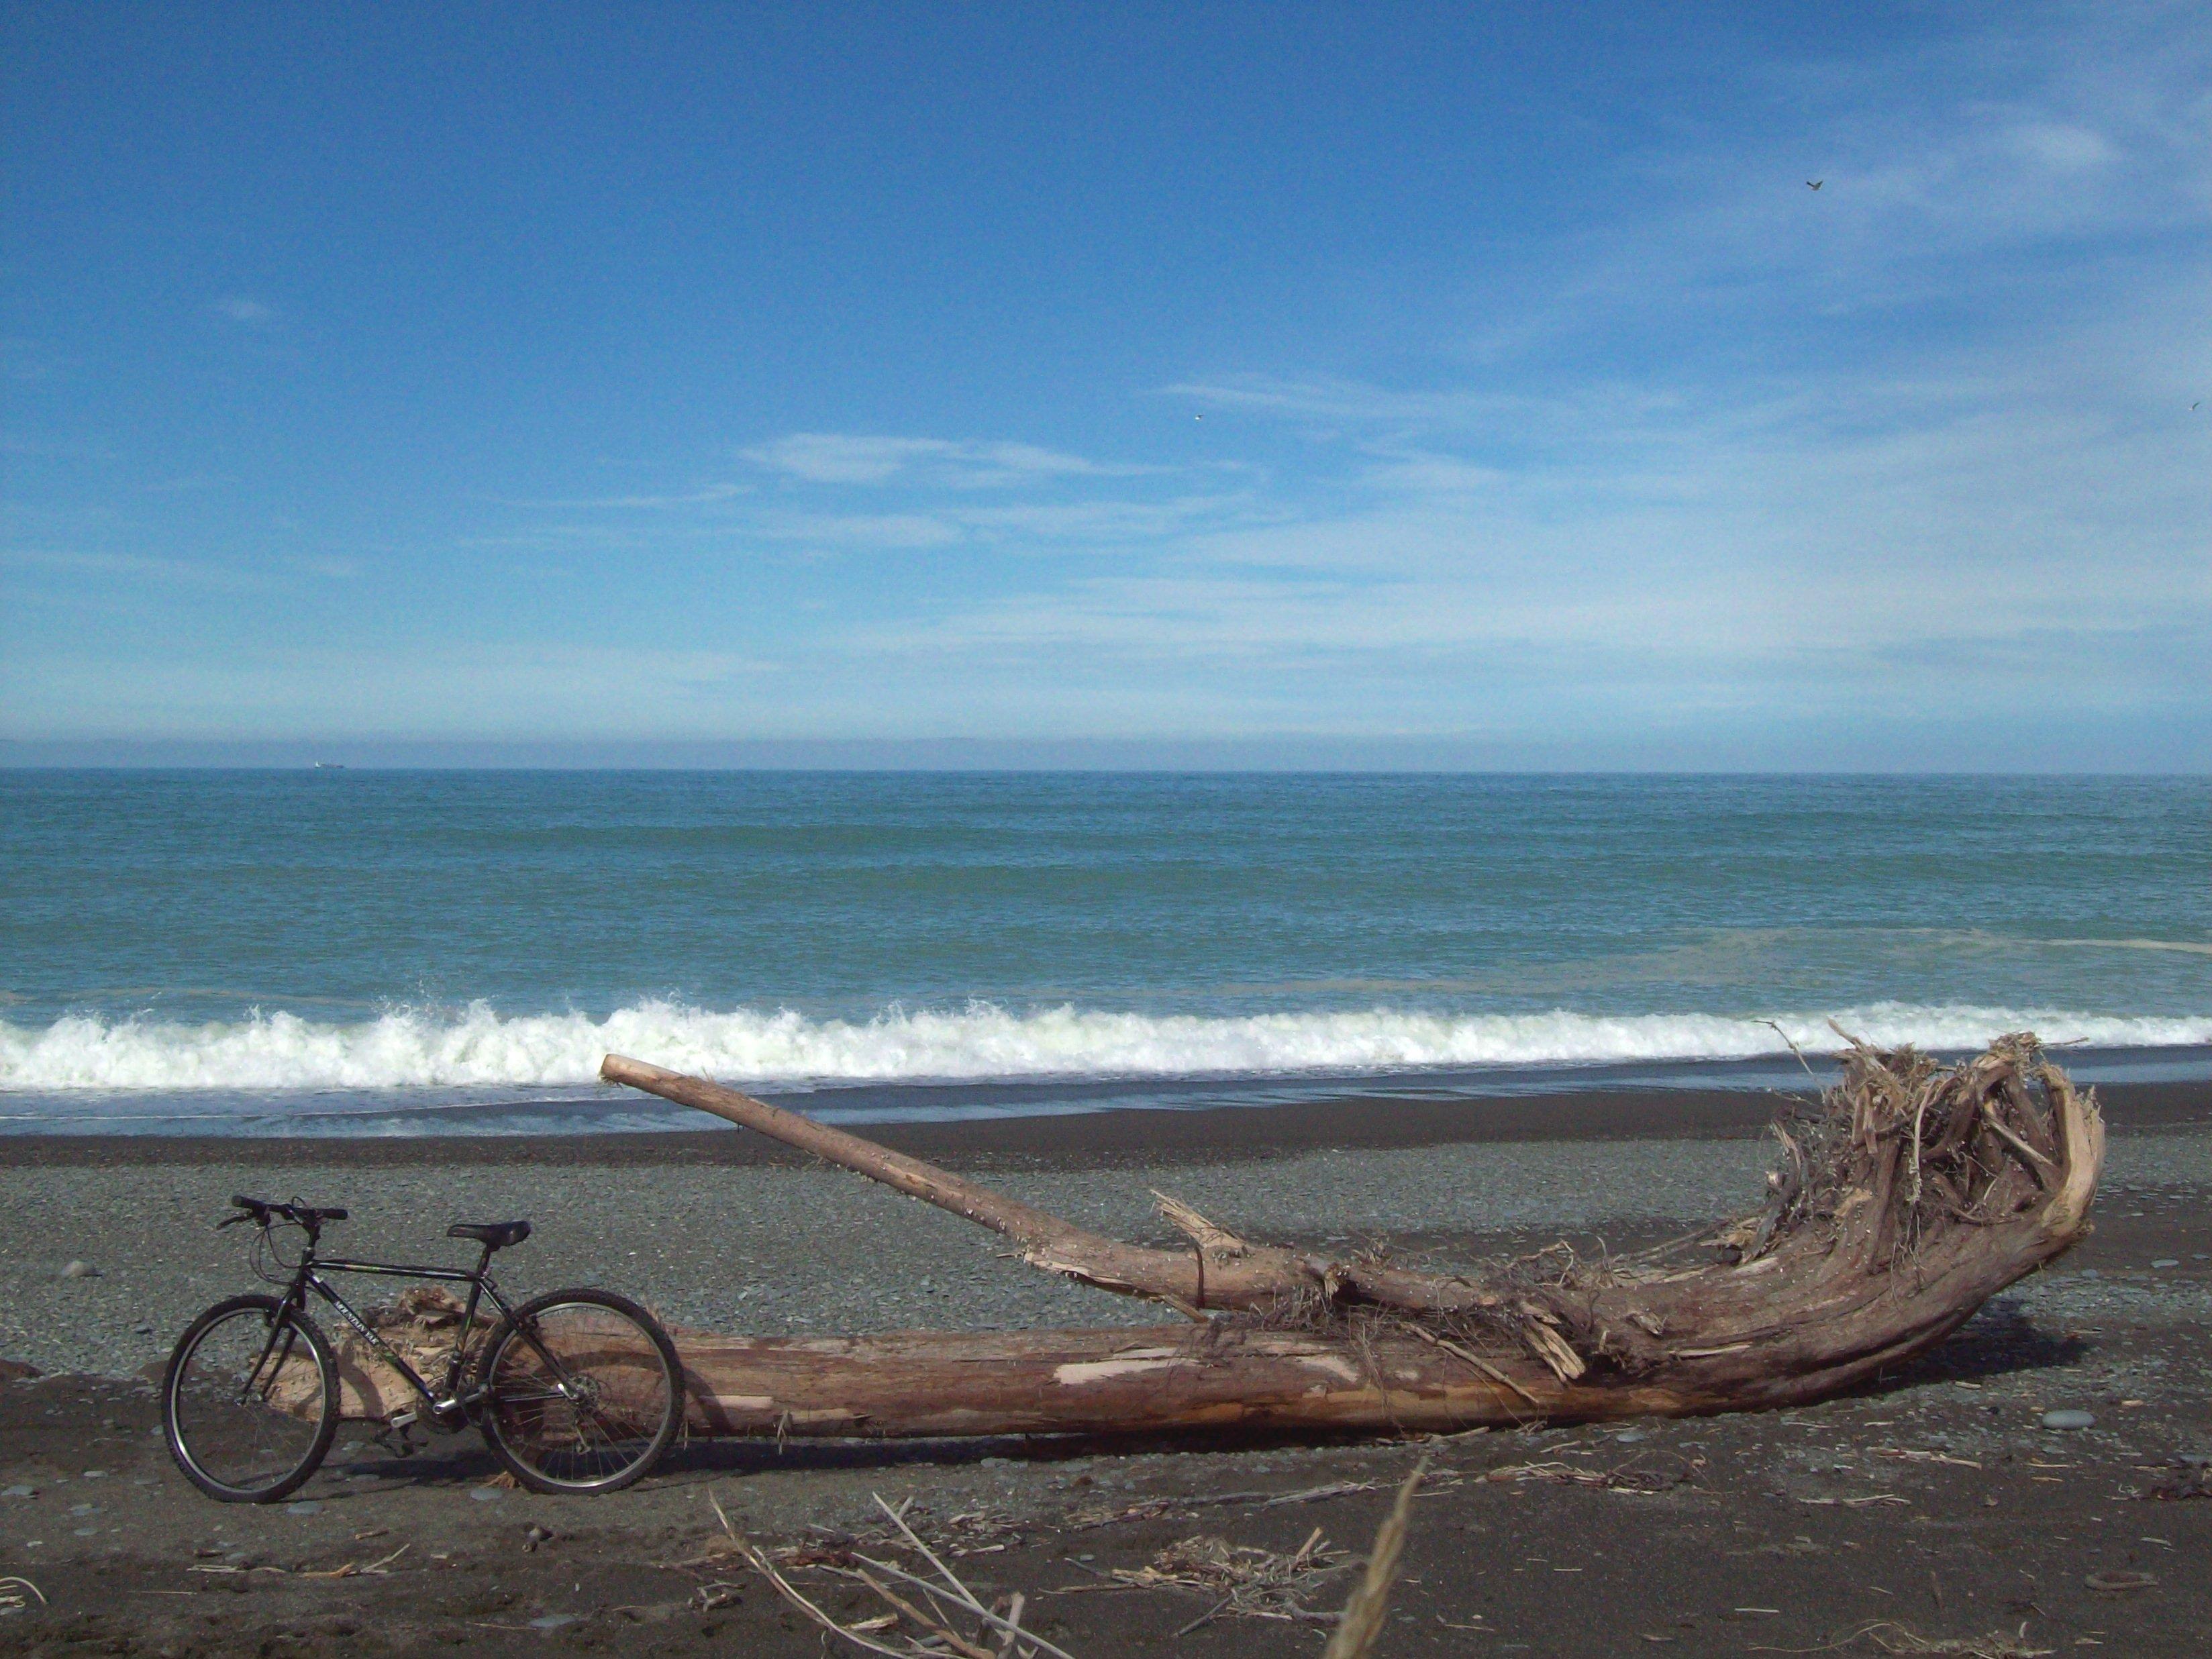 Black Bike in South Canterbury, Surf, Skin, Temuka, Waves, HQ Photo